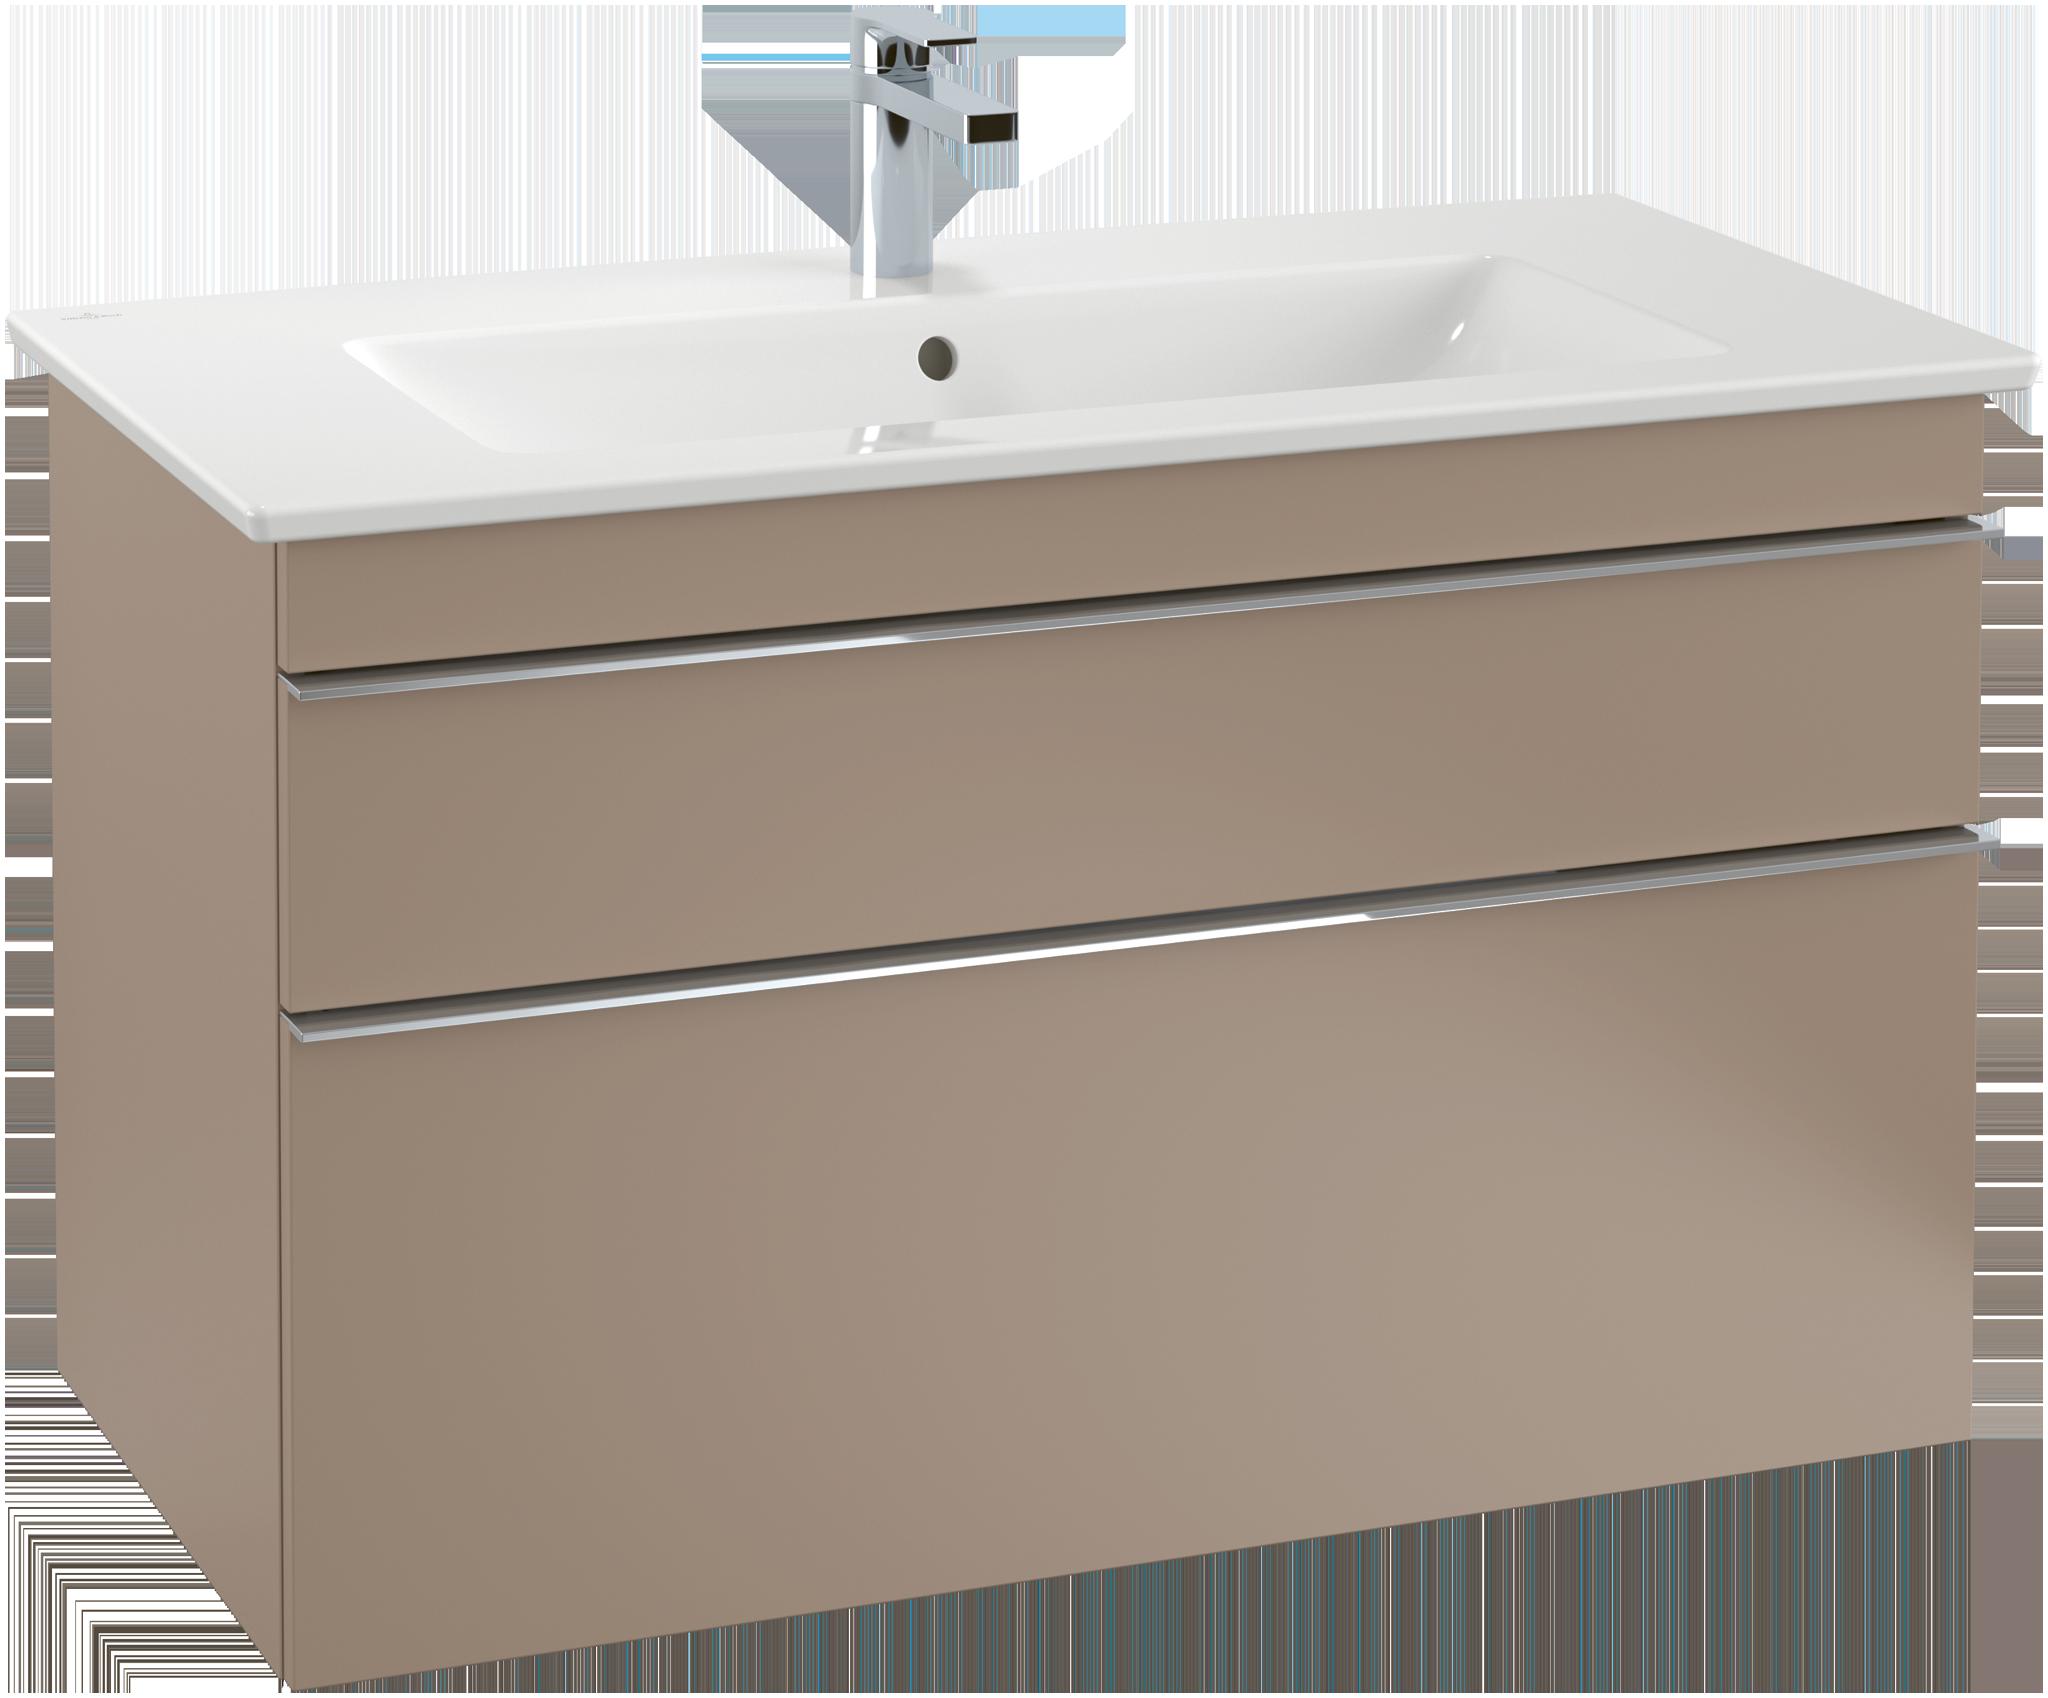 venticello waschtischunterschrank a92501 villeroy boch. Black Bedroom Furniture Sets. Home Design Ideas